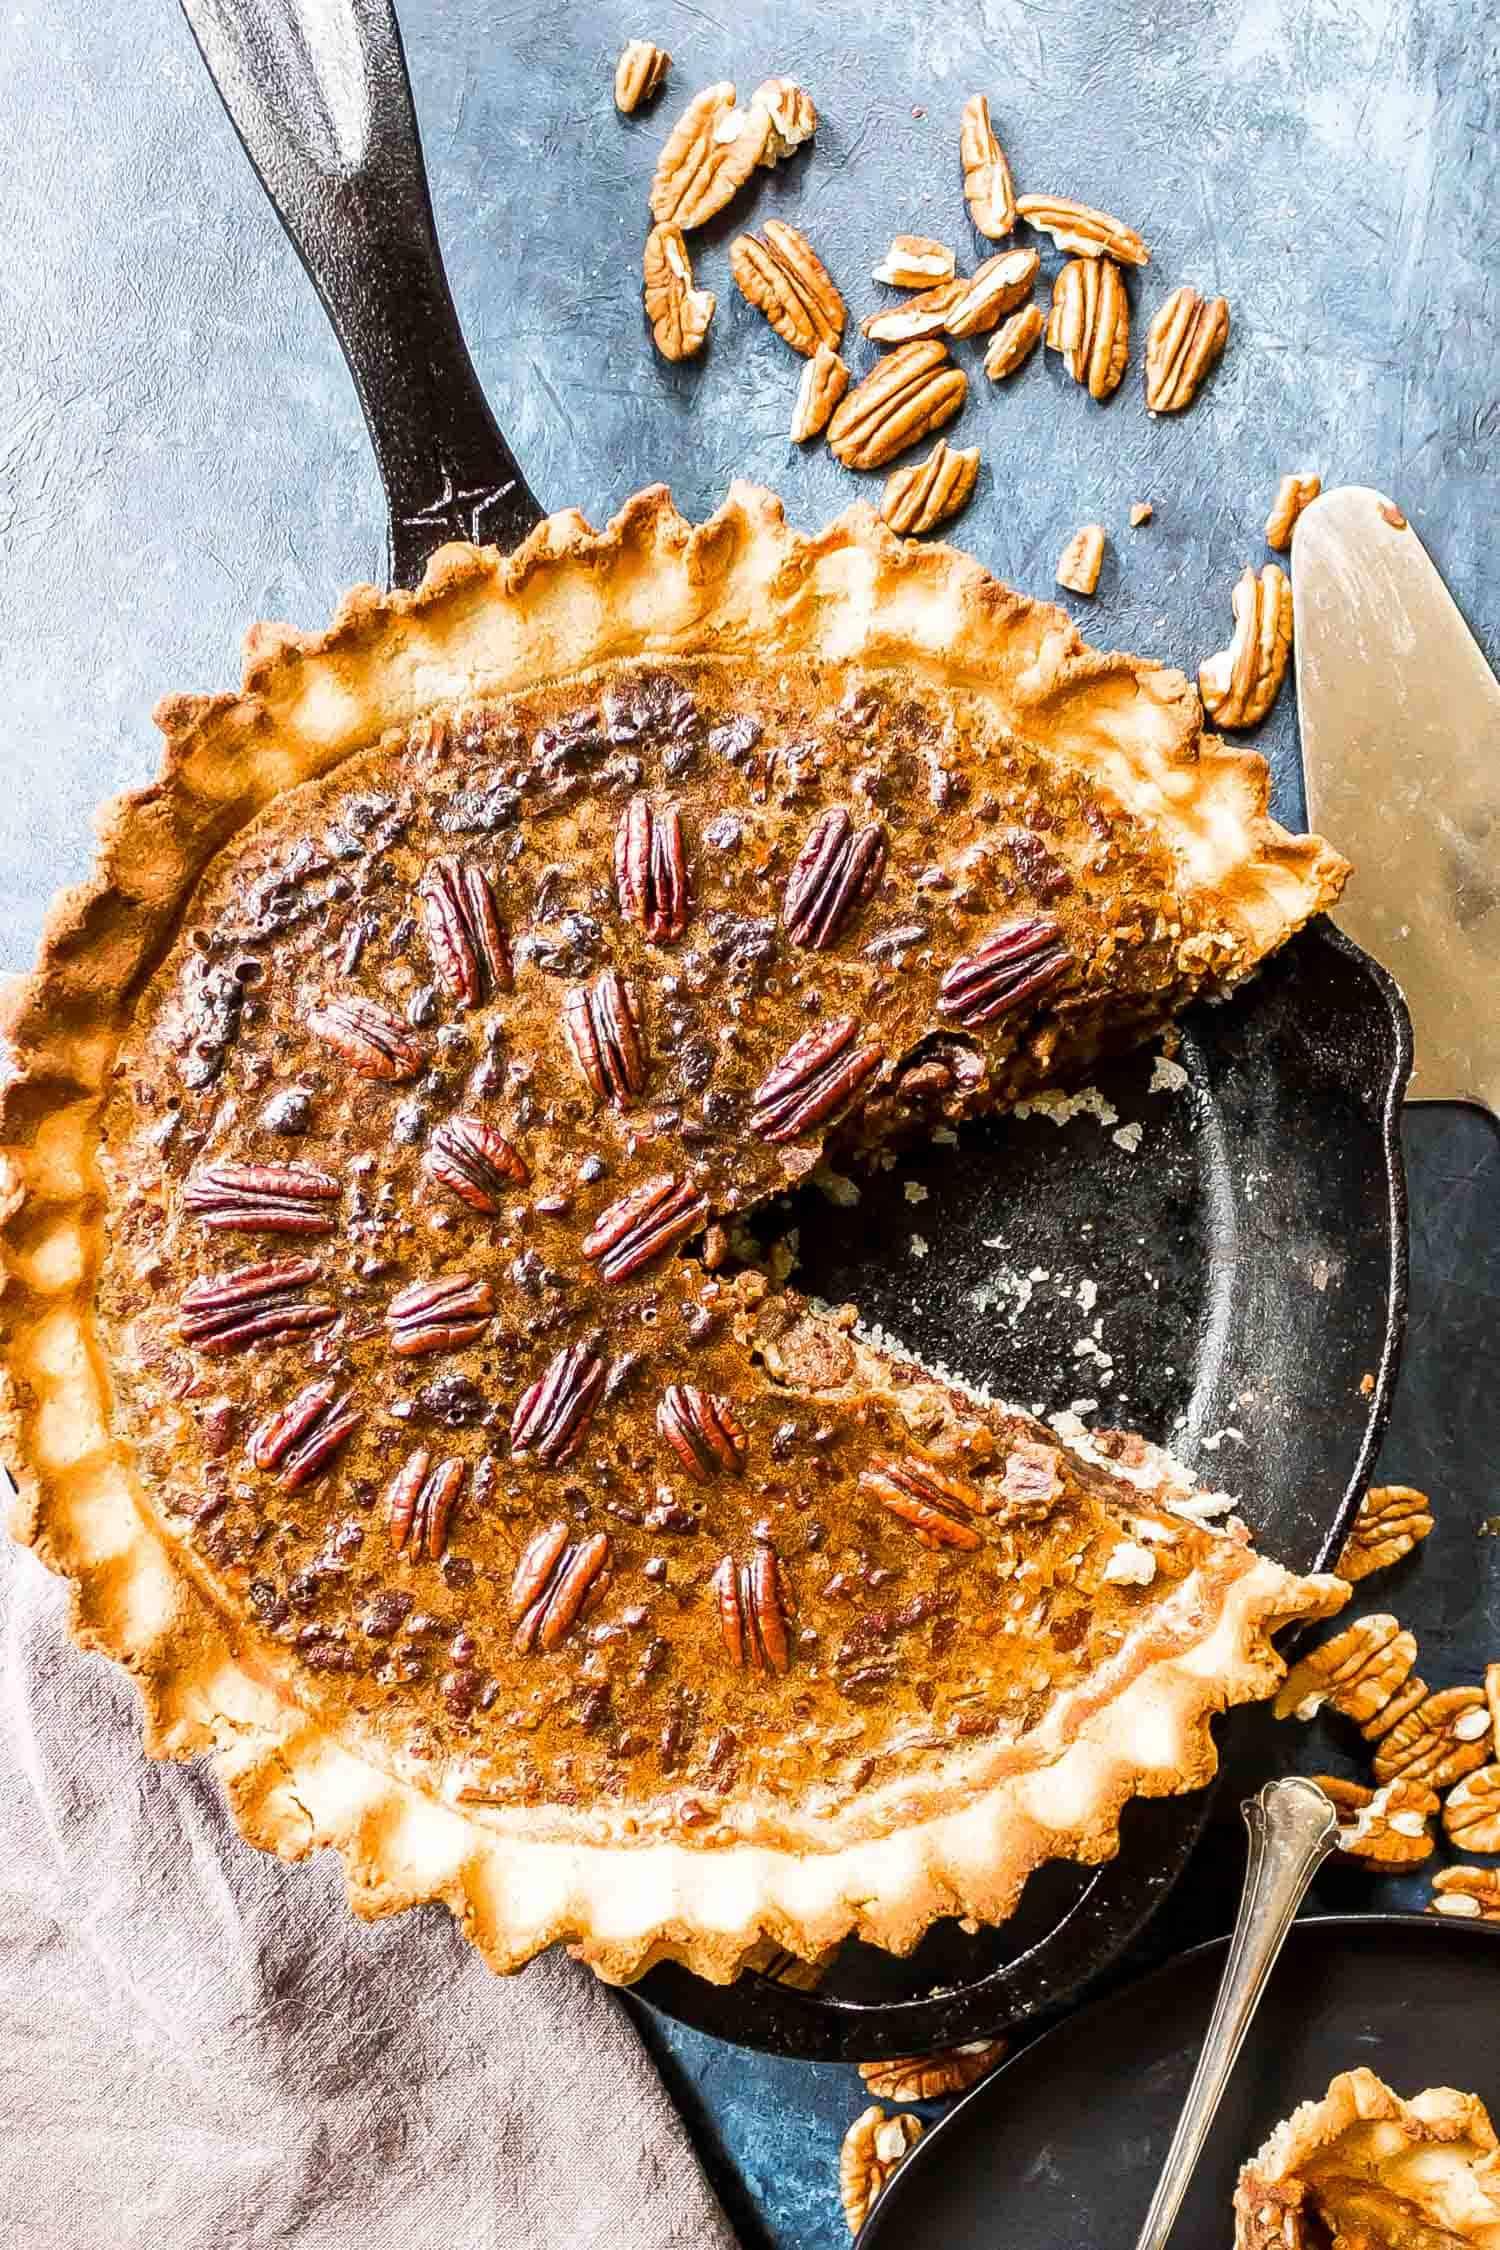 Keto Pecan Pie in a cast iron skillet